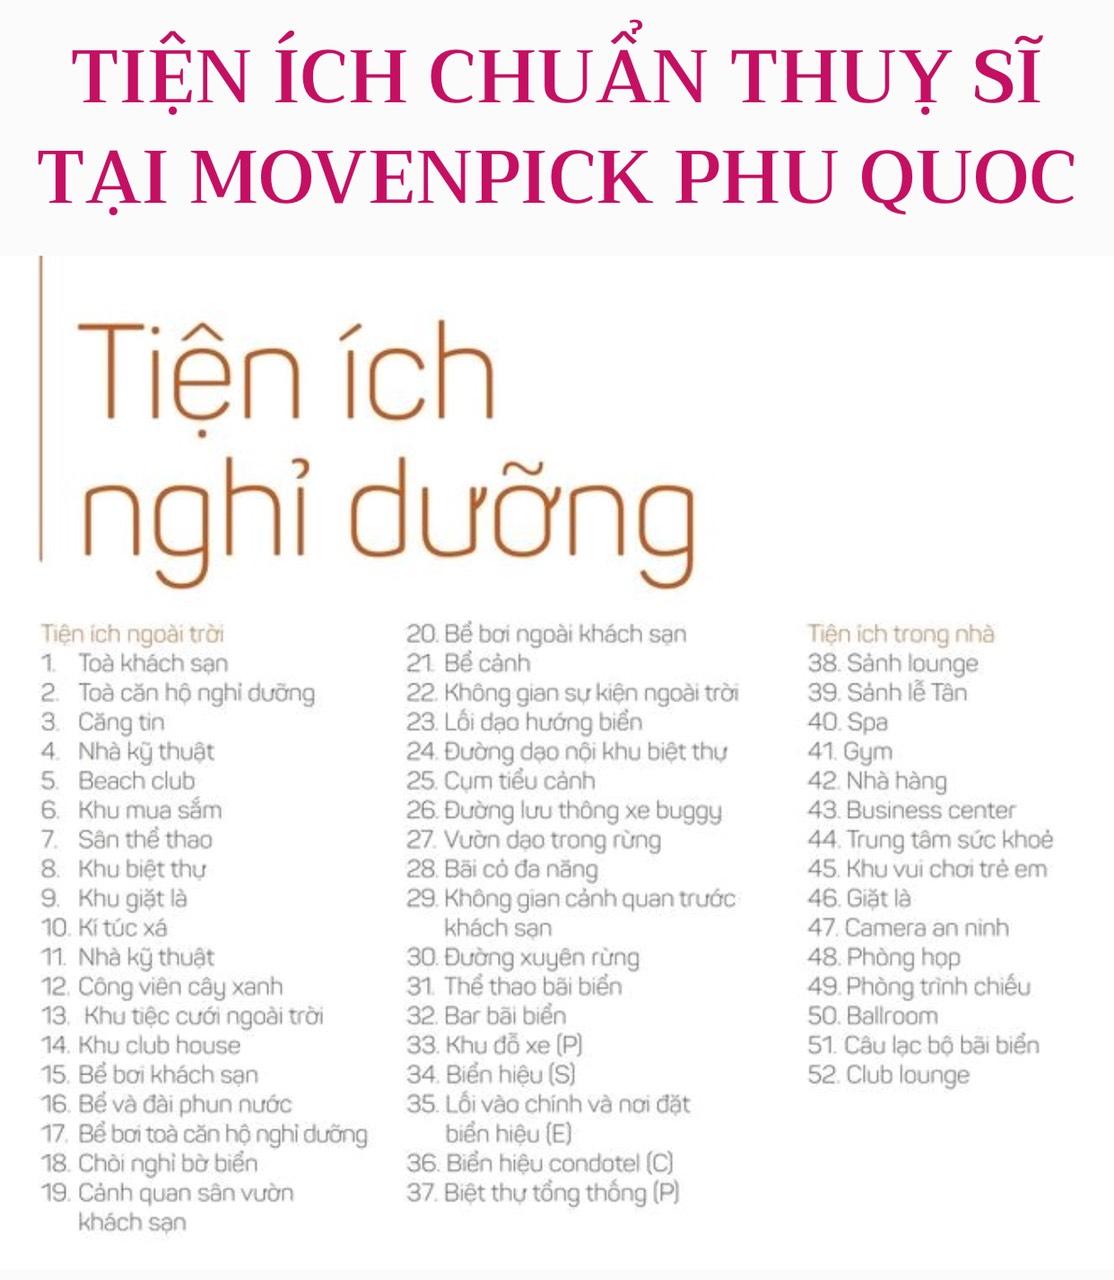 tien-ich-nghi-duong-dang-cap-thuy-sy-cua-movenpick-phu-quoc